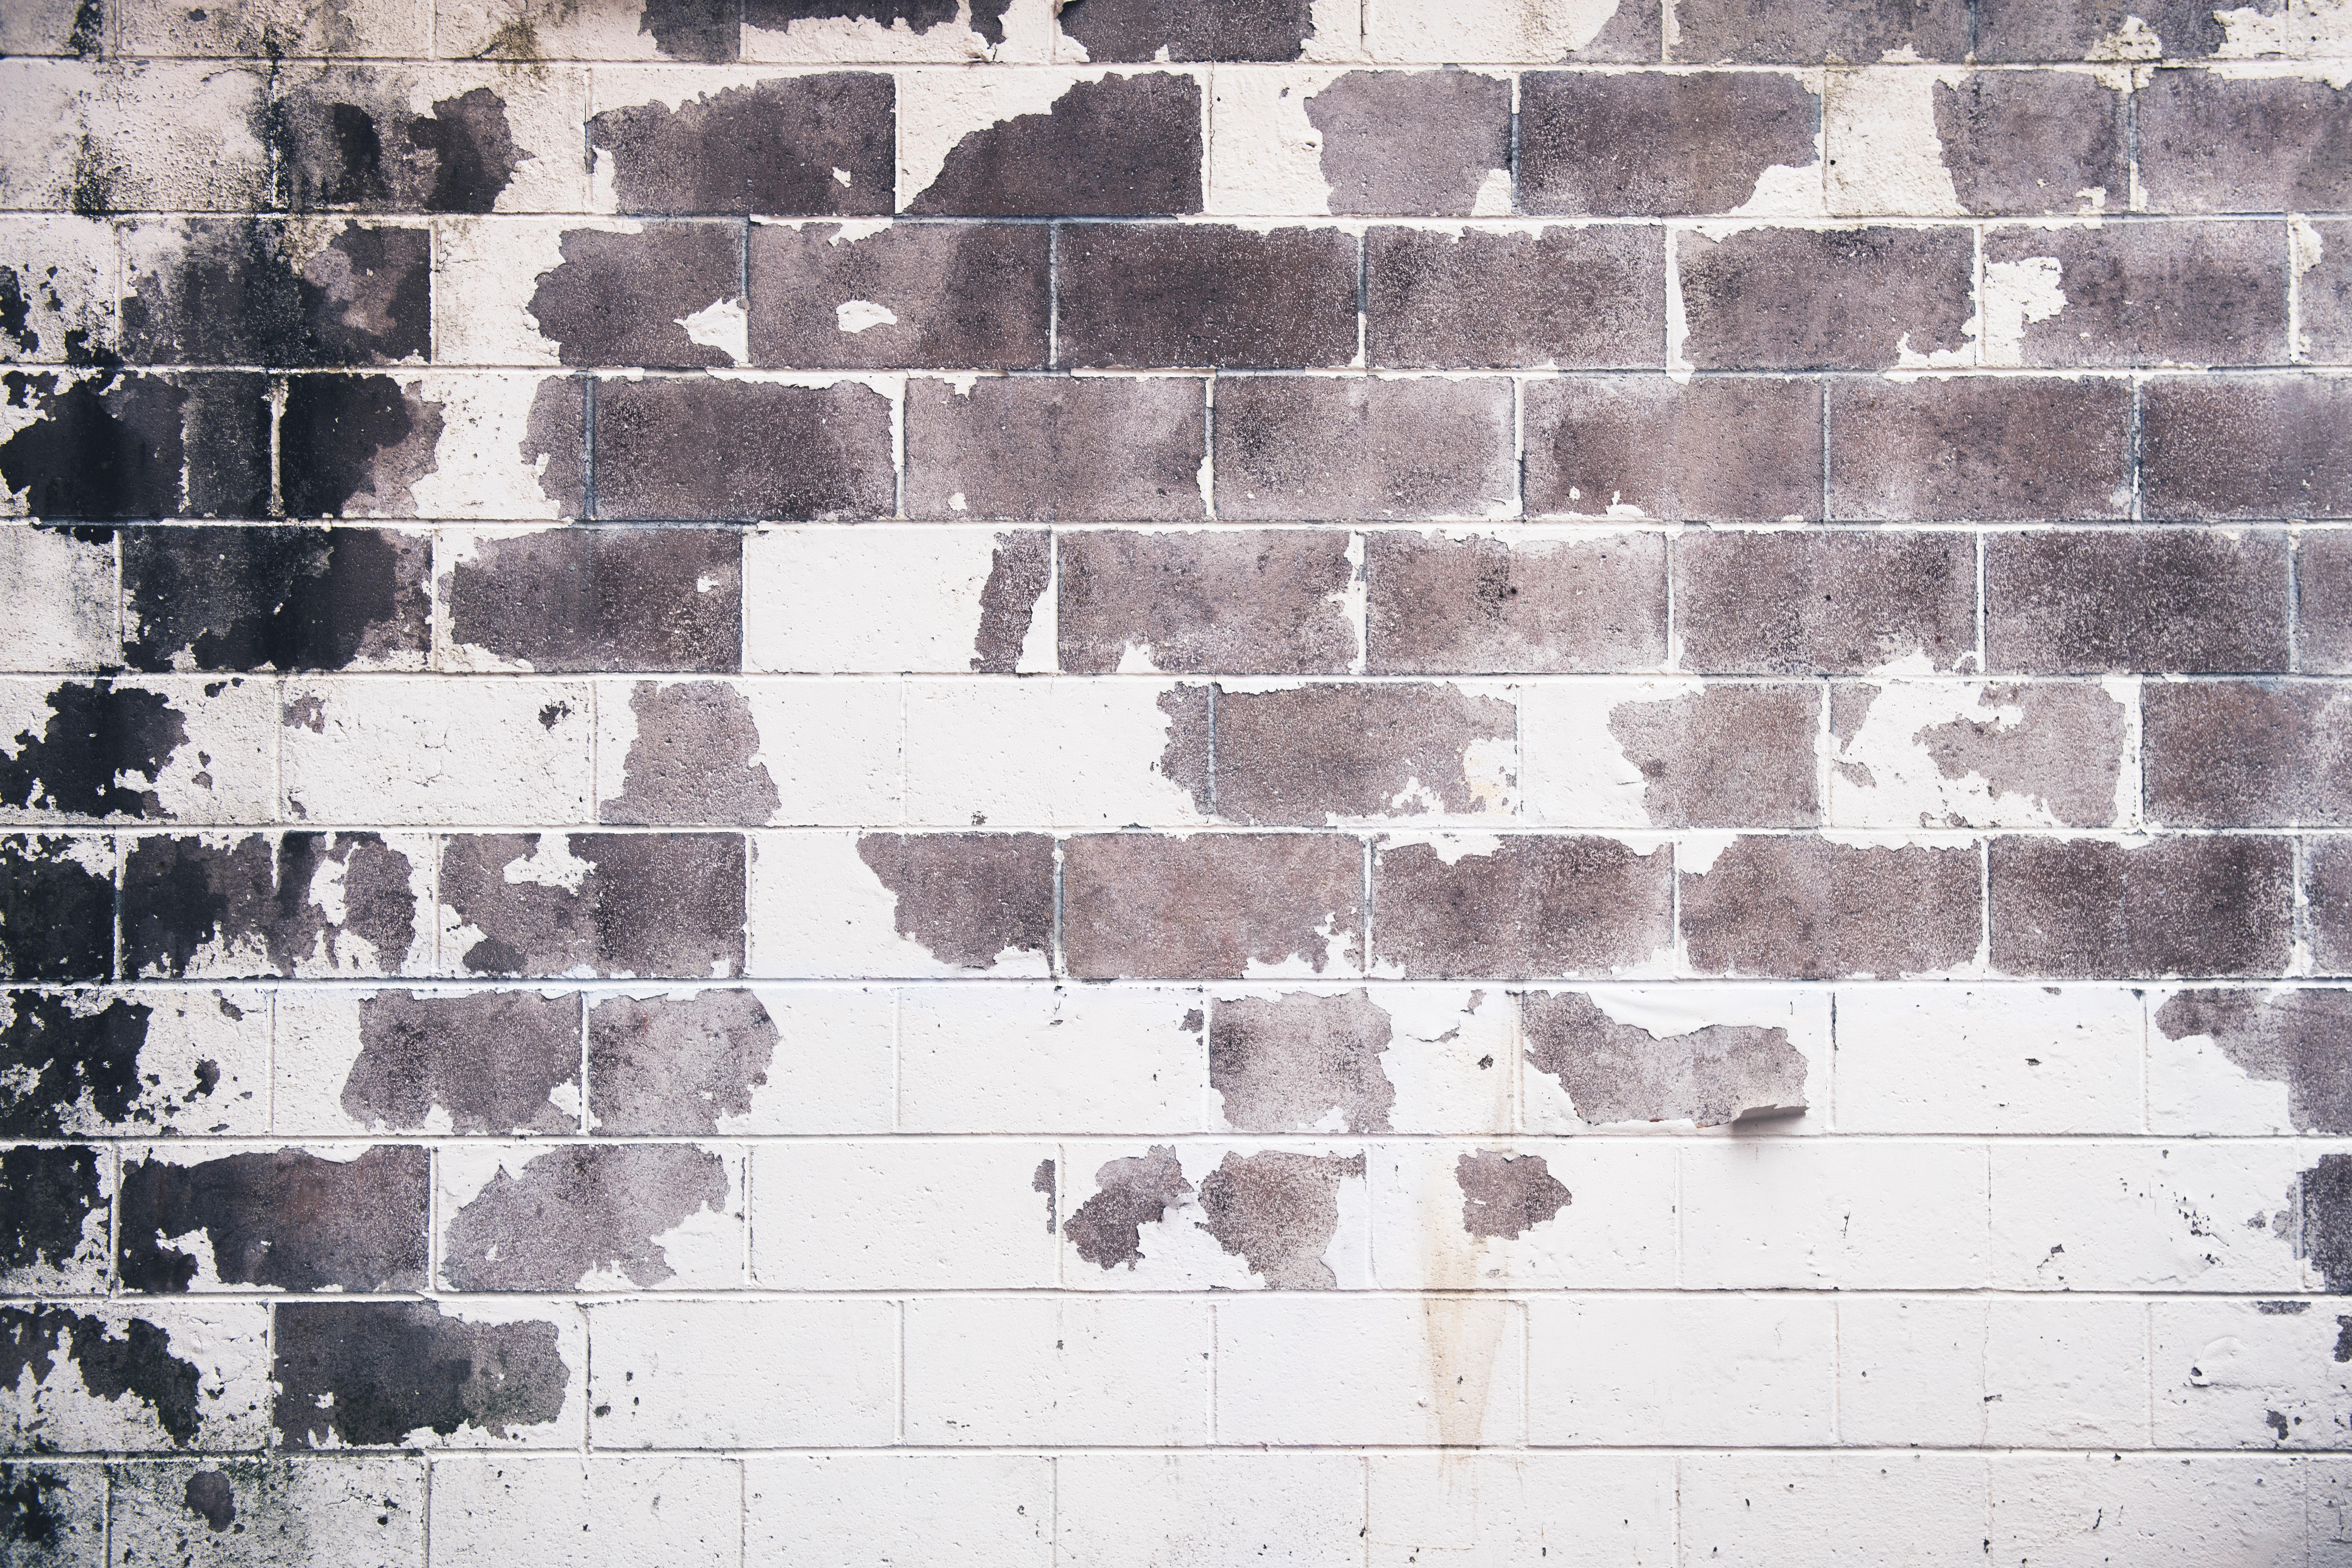 White and gray concrete brick wall photo